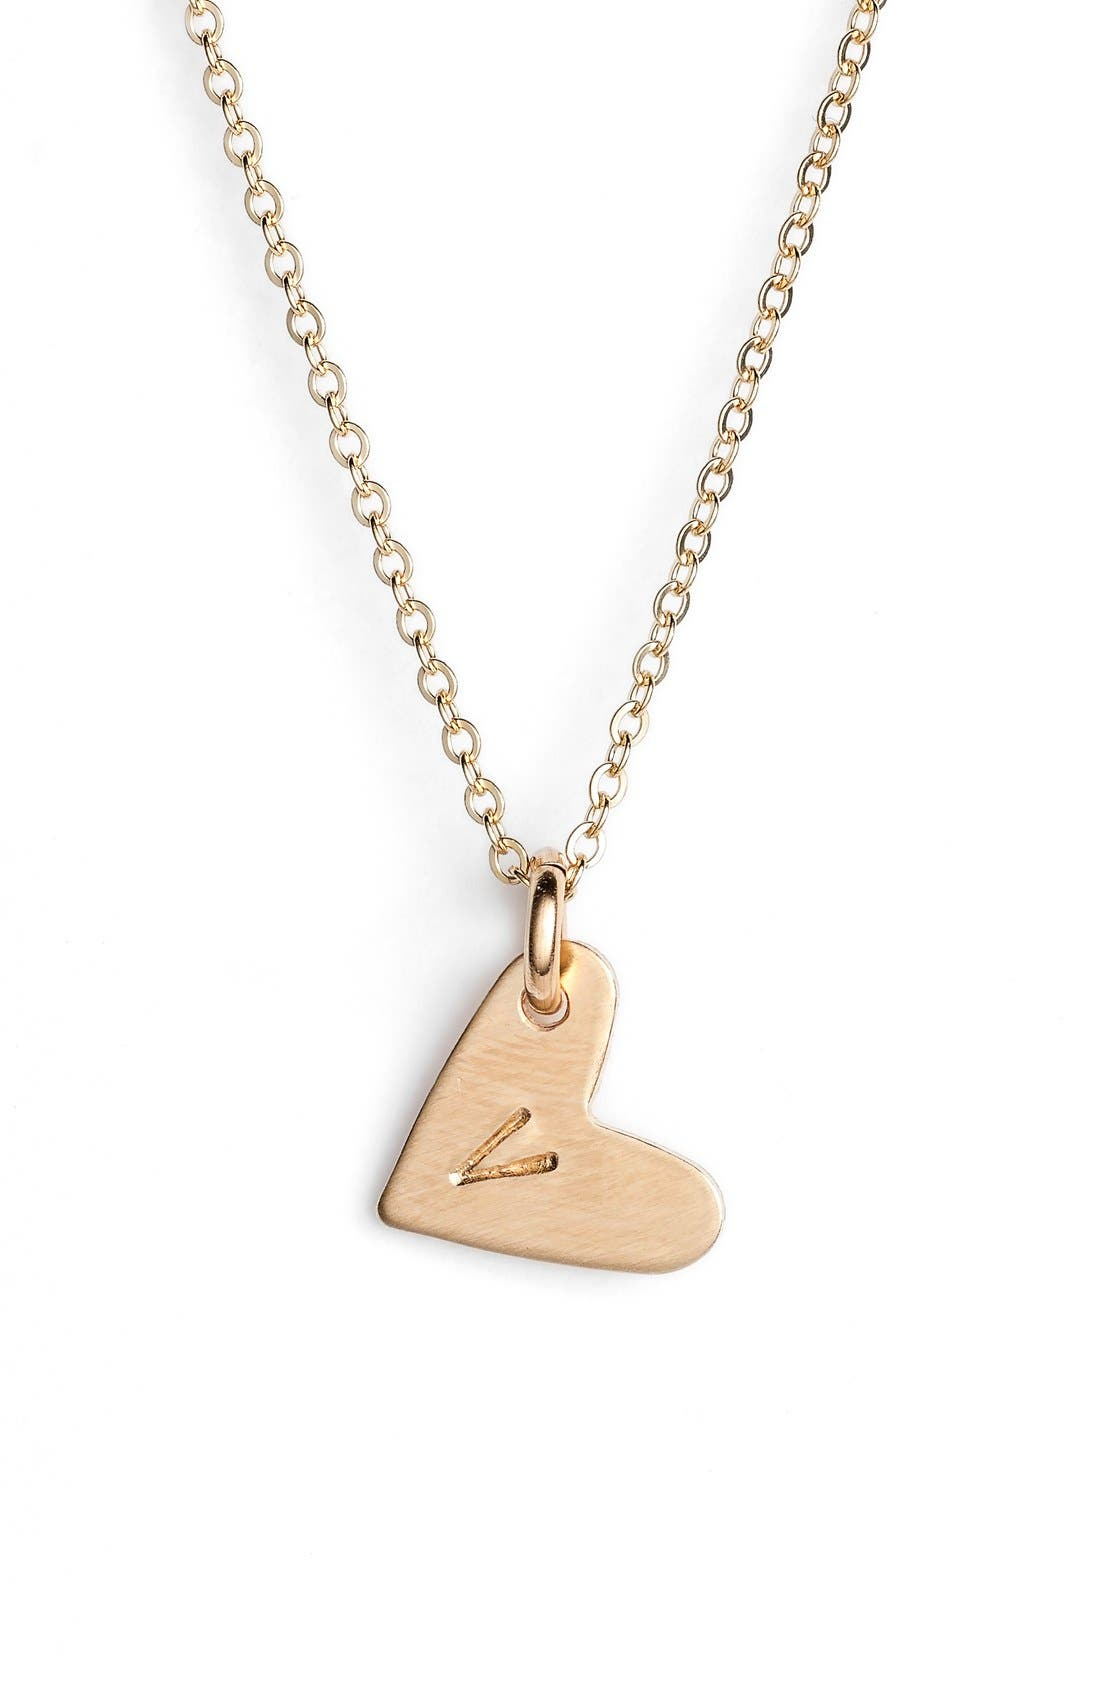 Main Image - Nashelle 14k-Gold Fill Initial Mini Heart Pendant Necklace